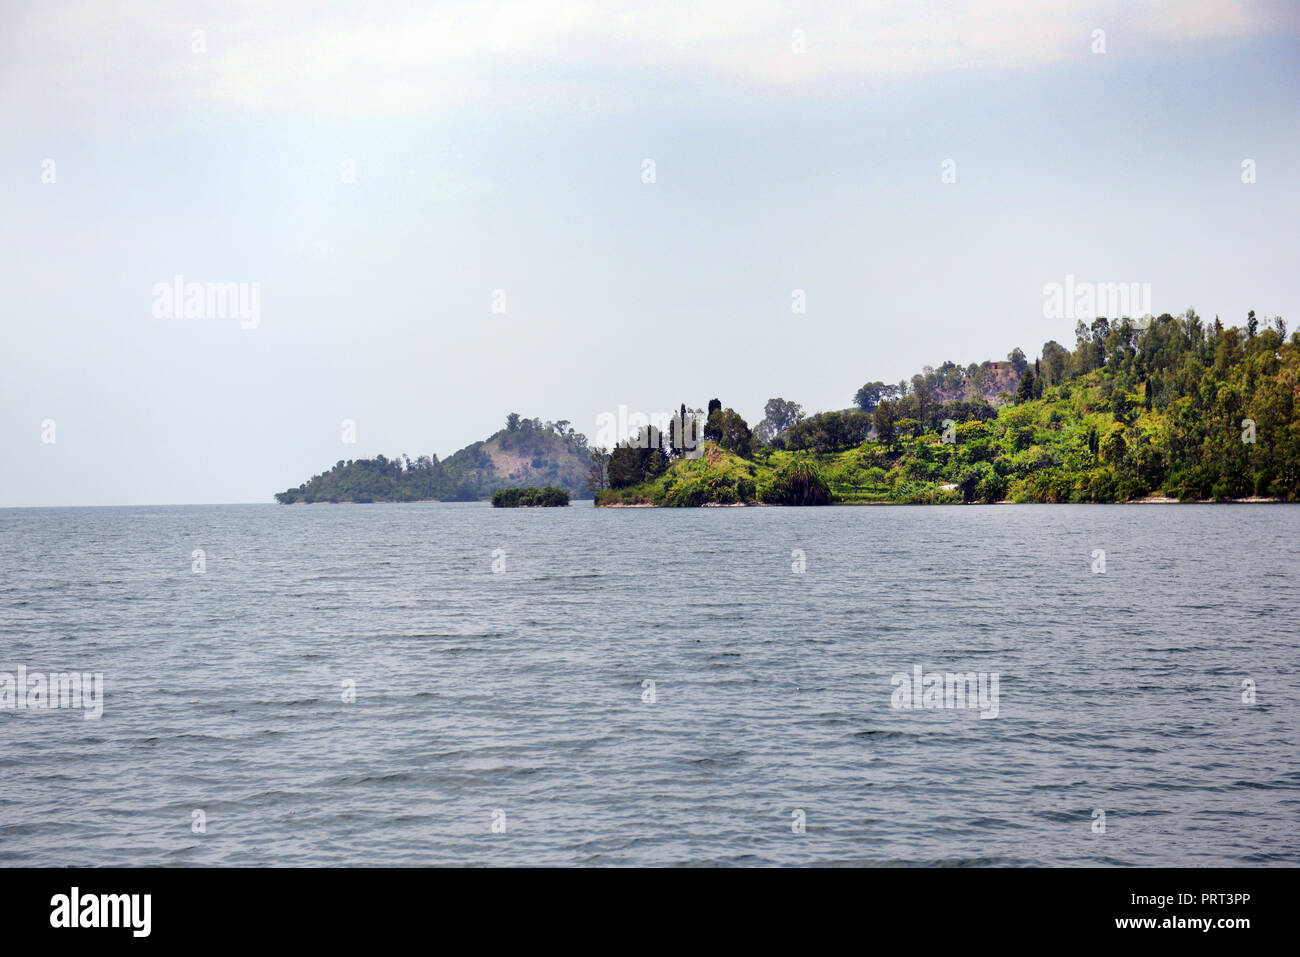 Scenic Lake Kivu in Rwanda. - Stock Image